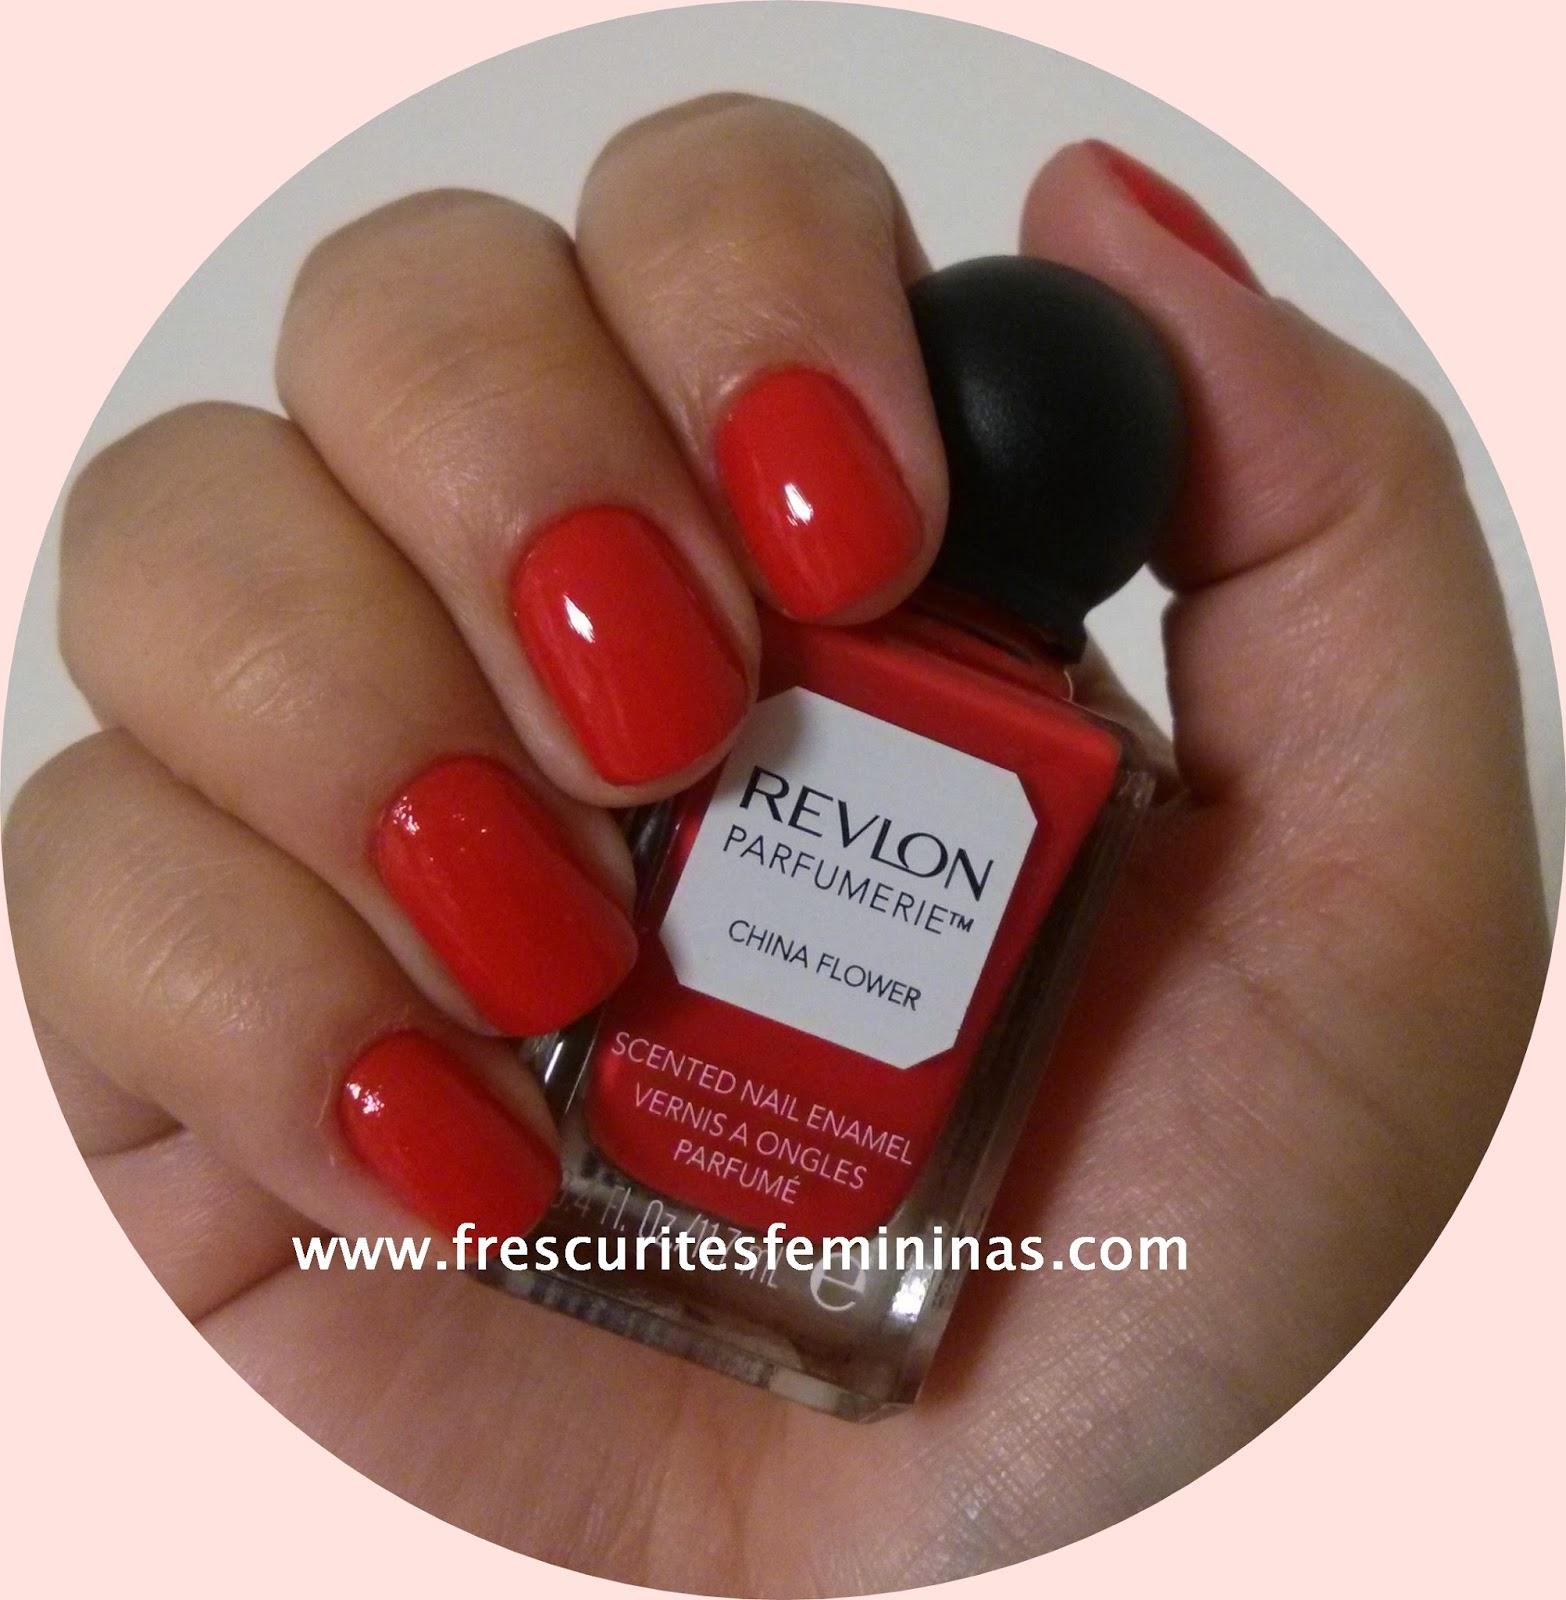 Revlon Perfumerie Frescurites Femininas Red Nails